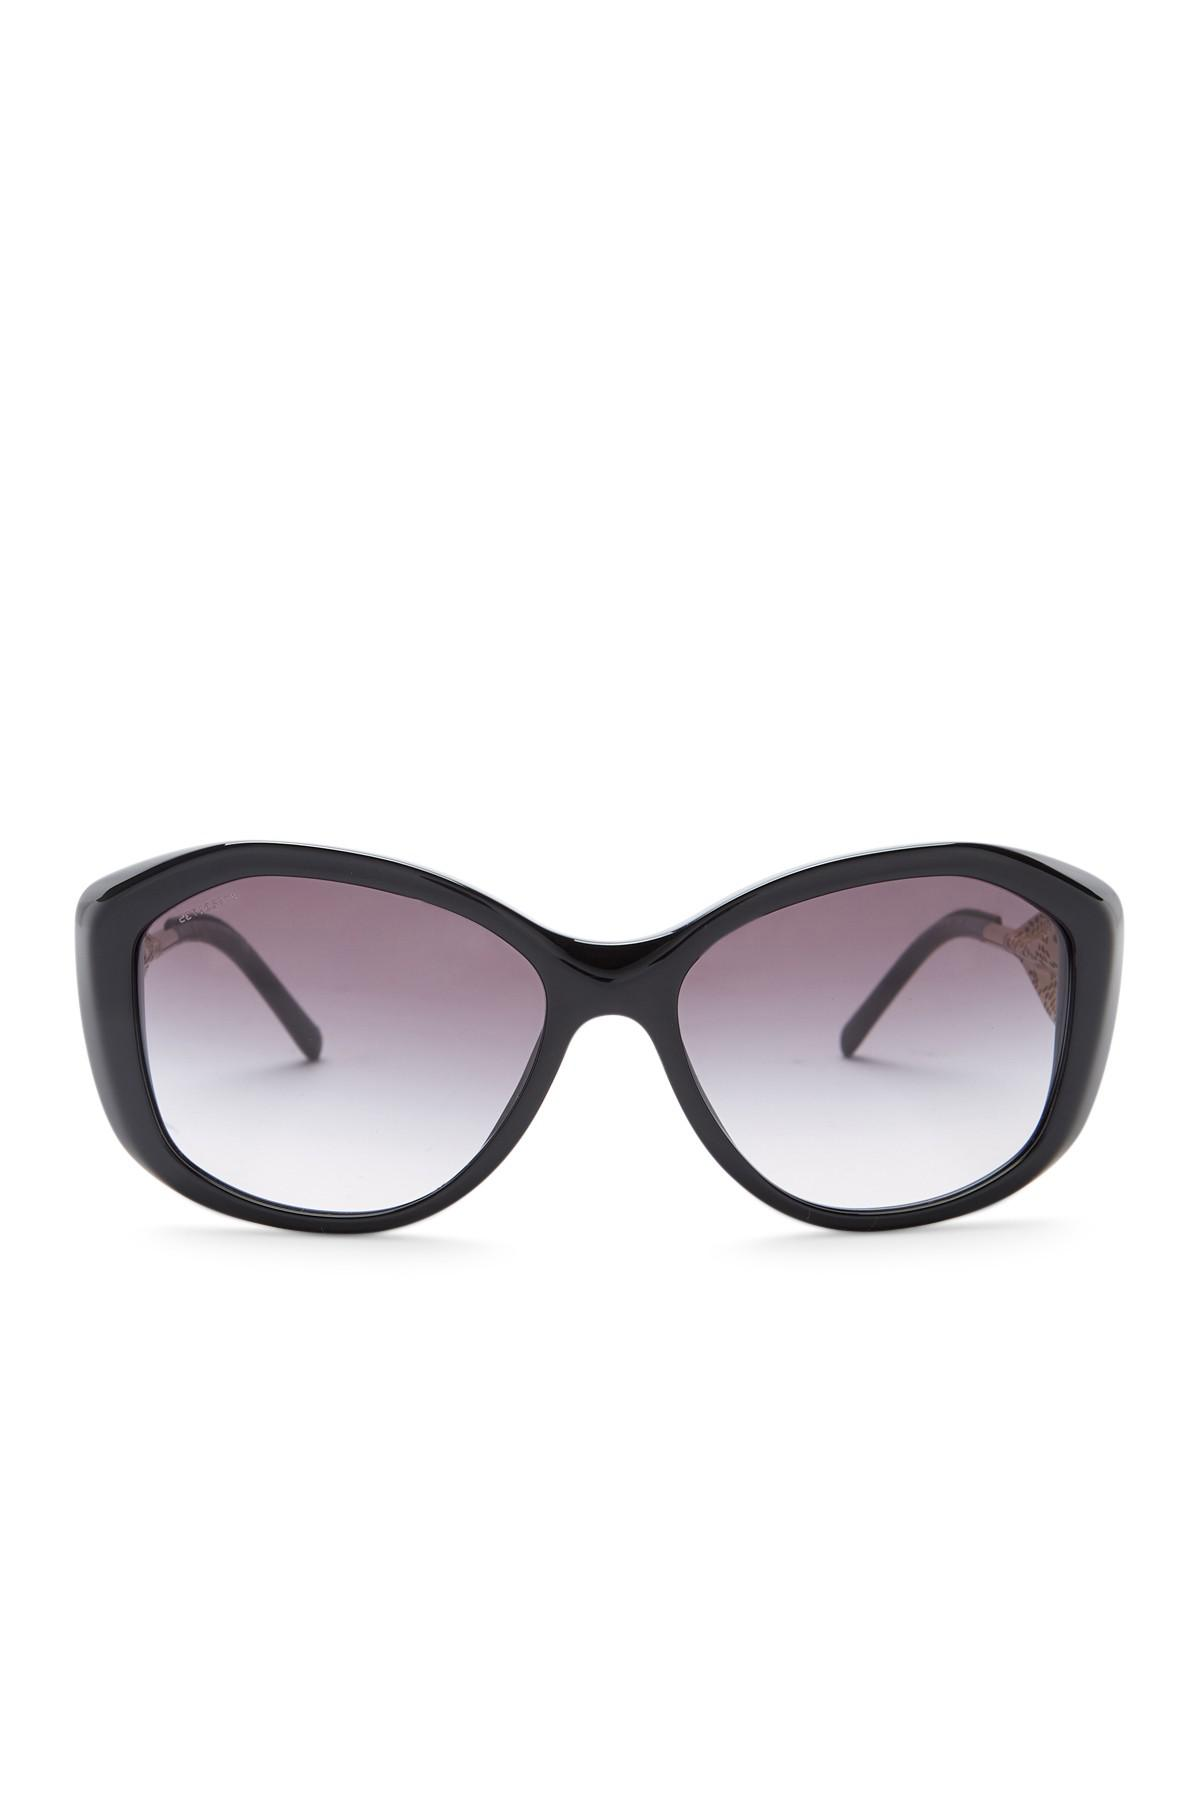 16252d23585 Lyst - Burberry Women s 57mm Oversized Sunglasses in Black